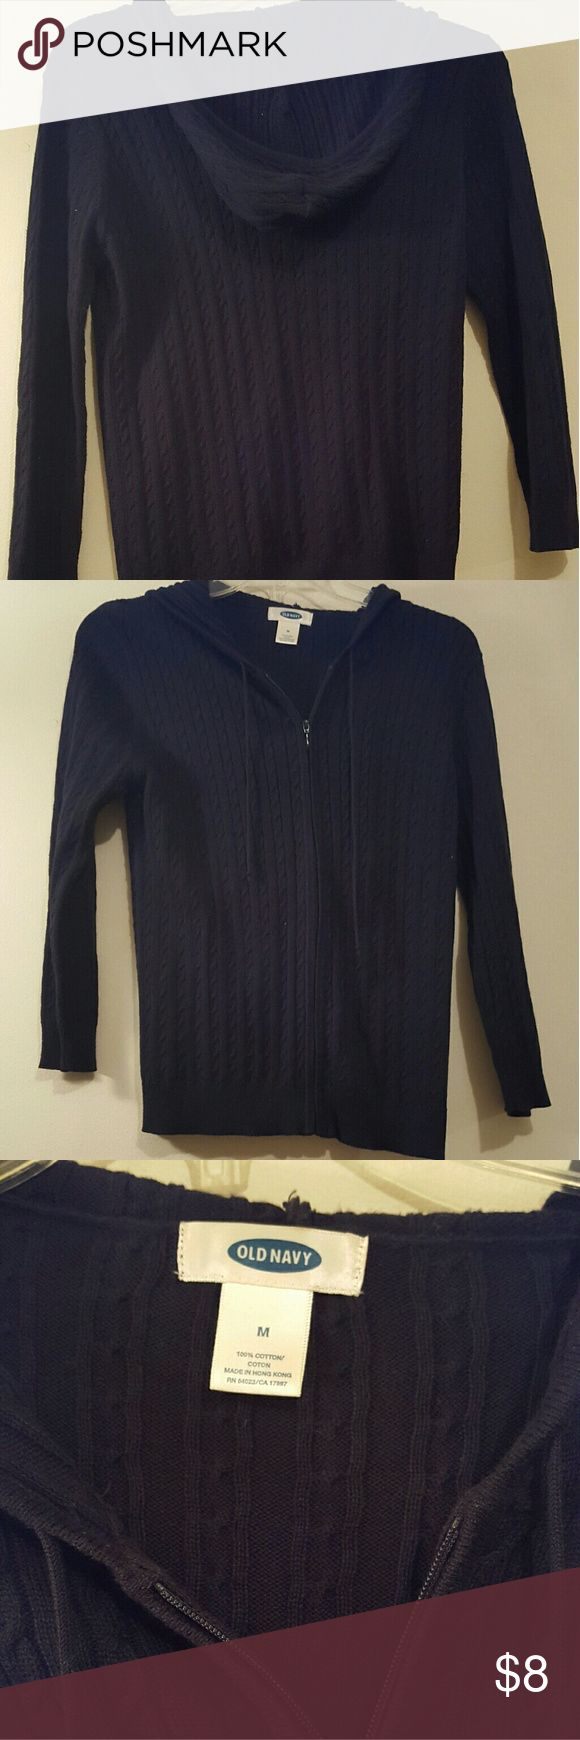 Old navy zip up sweater size Medium Black Old navy zip up sweater size Medium Black Old Navy Sweaters Cardigans